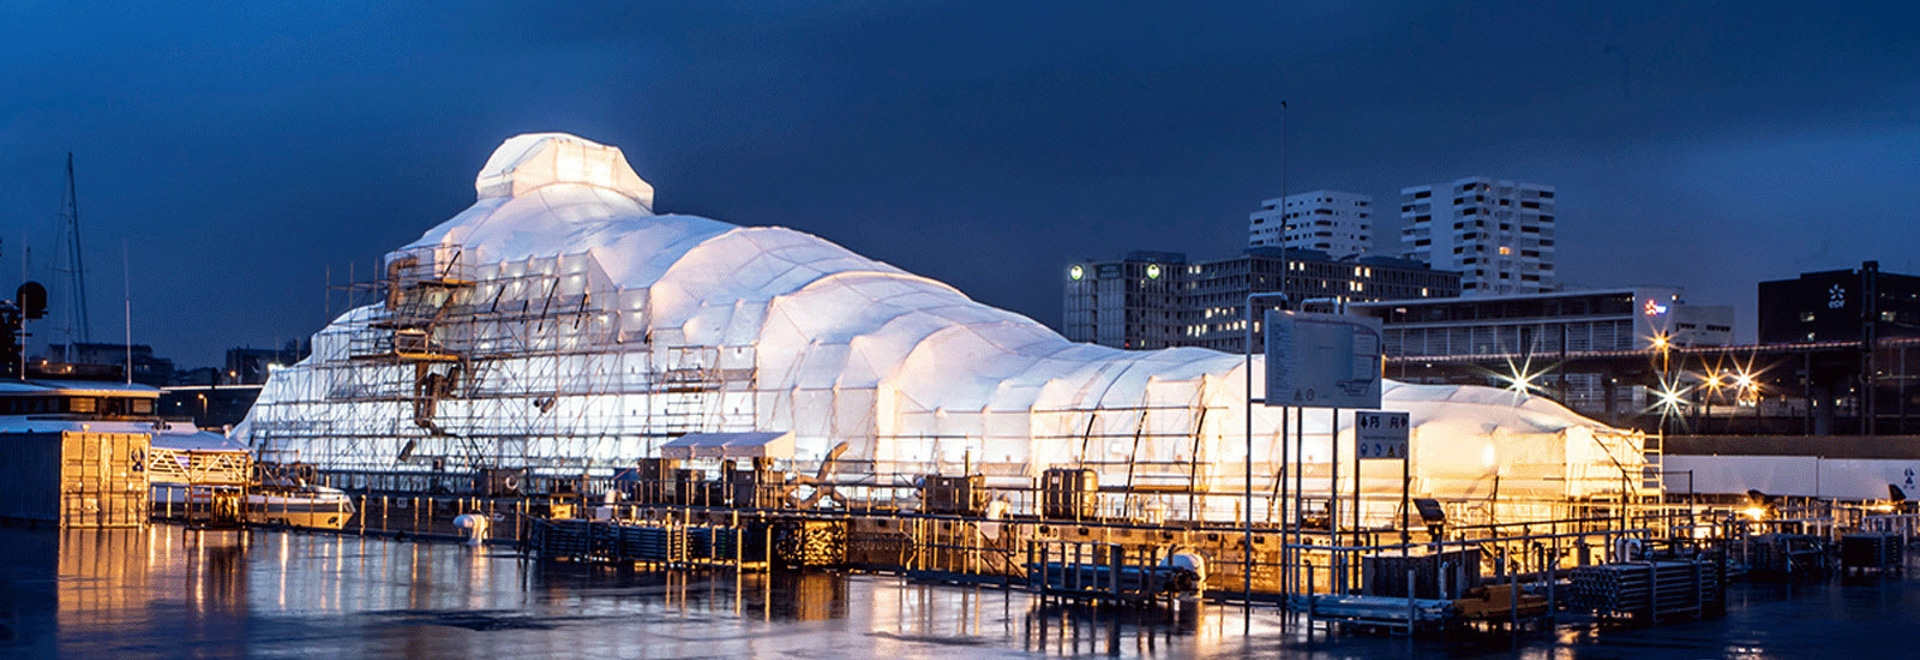 Palumbo Superyachts Marseille Completes Full Paint Job on 92 Metre Feadship